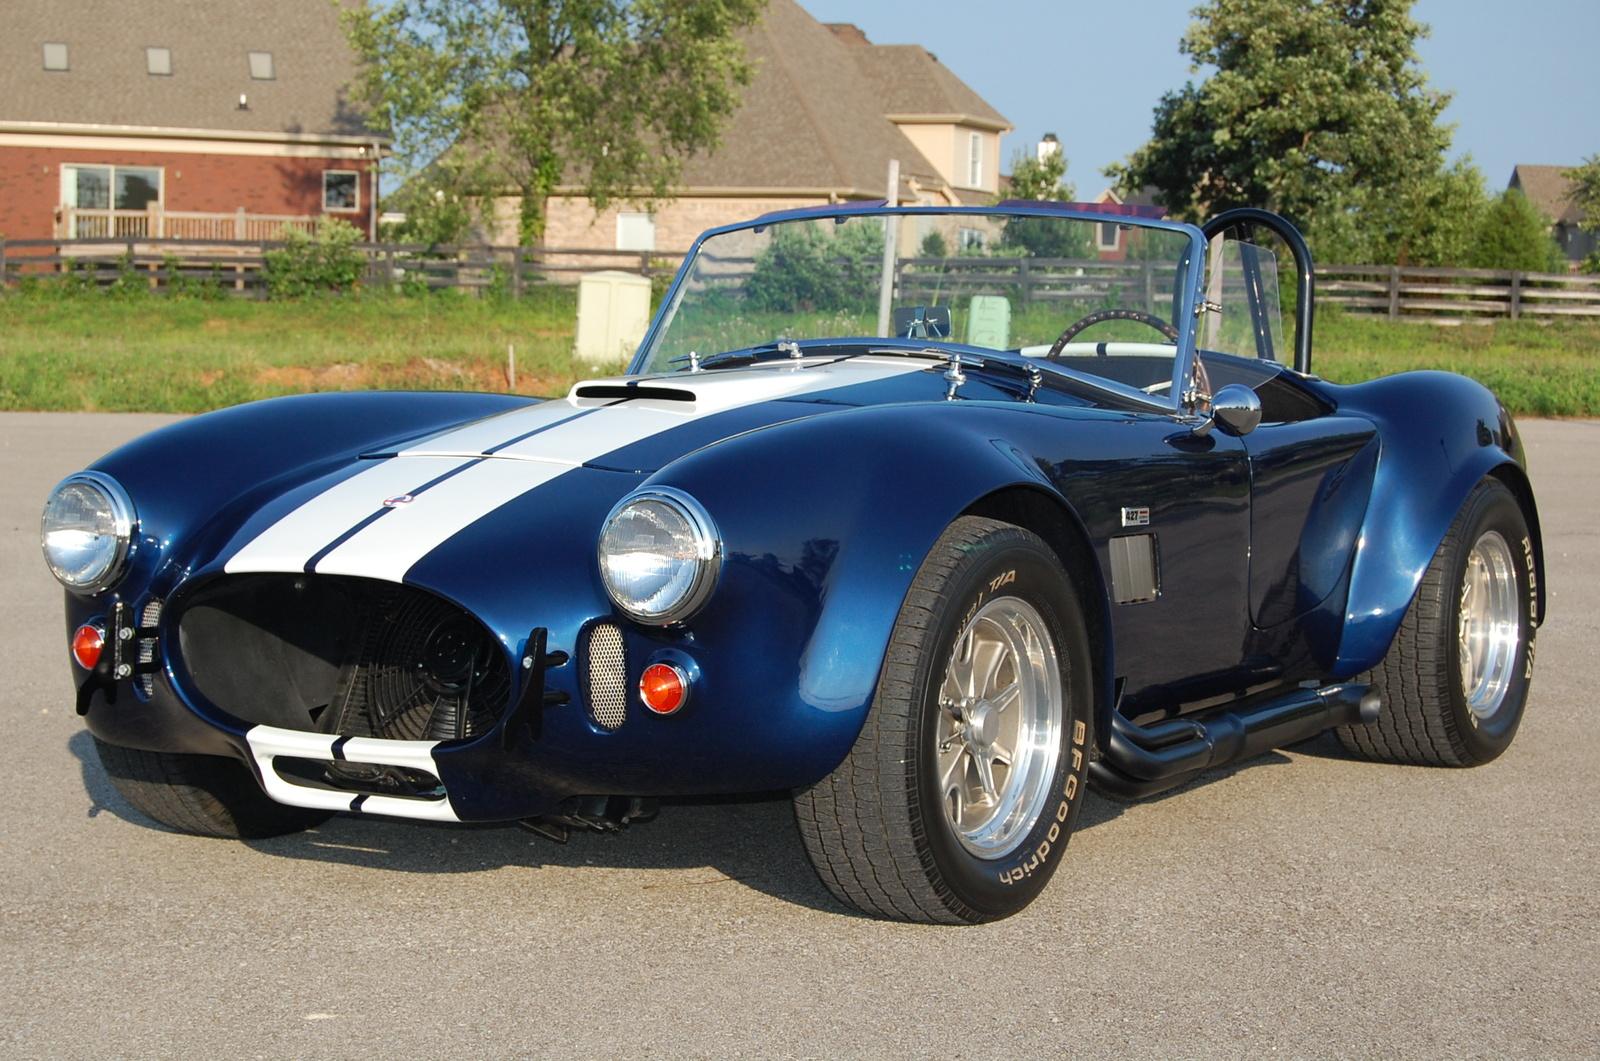 Image result for 1967 Shelby Cobra